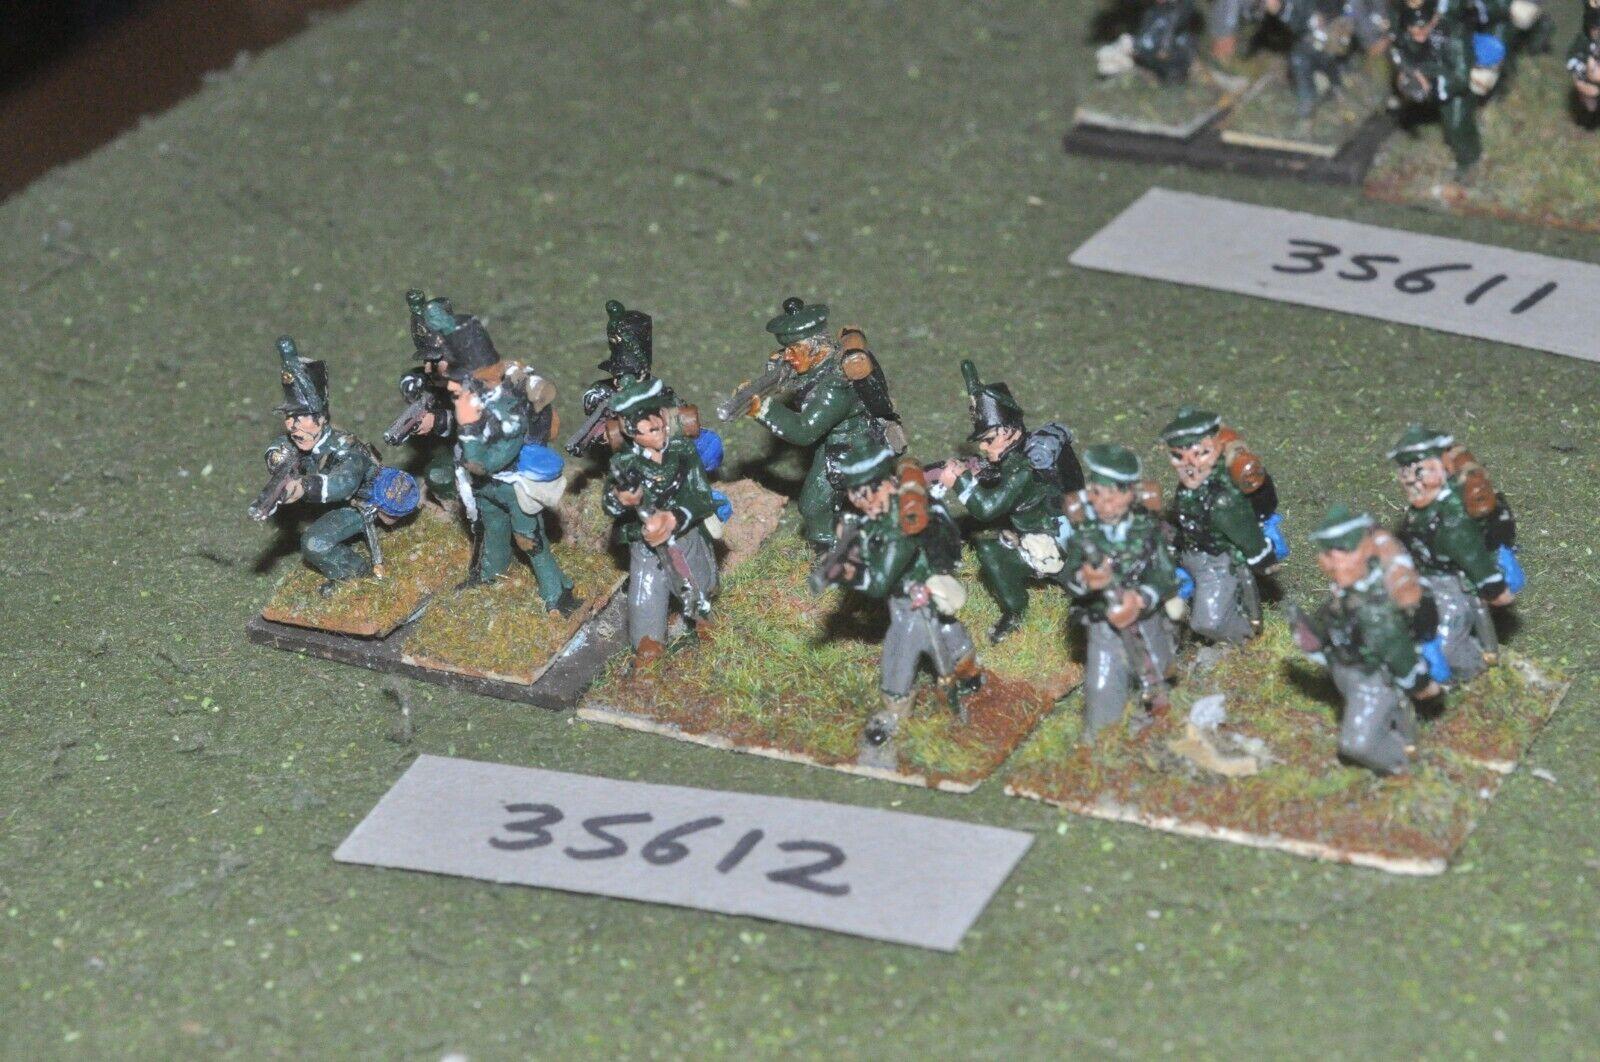 25mm napoleonic   british - riflemen 12 figures - inf (35612)